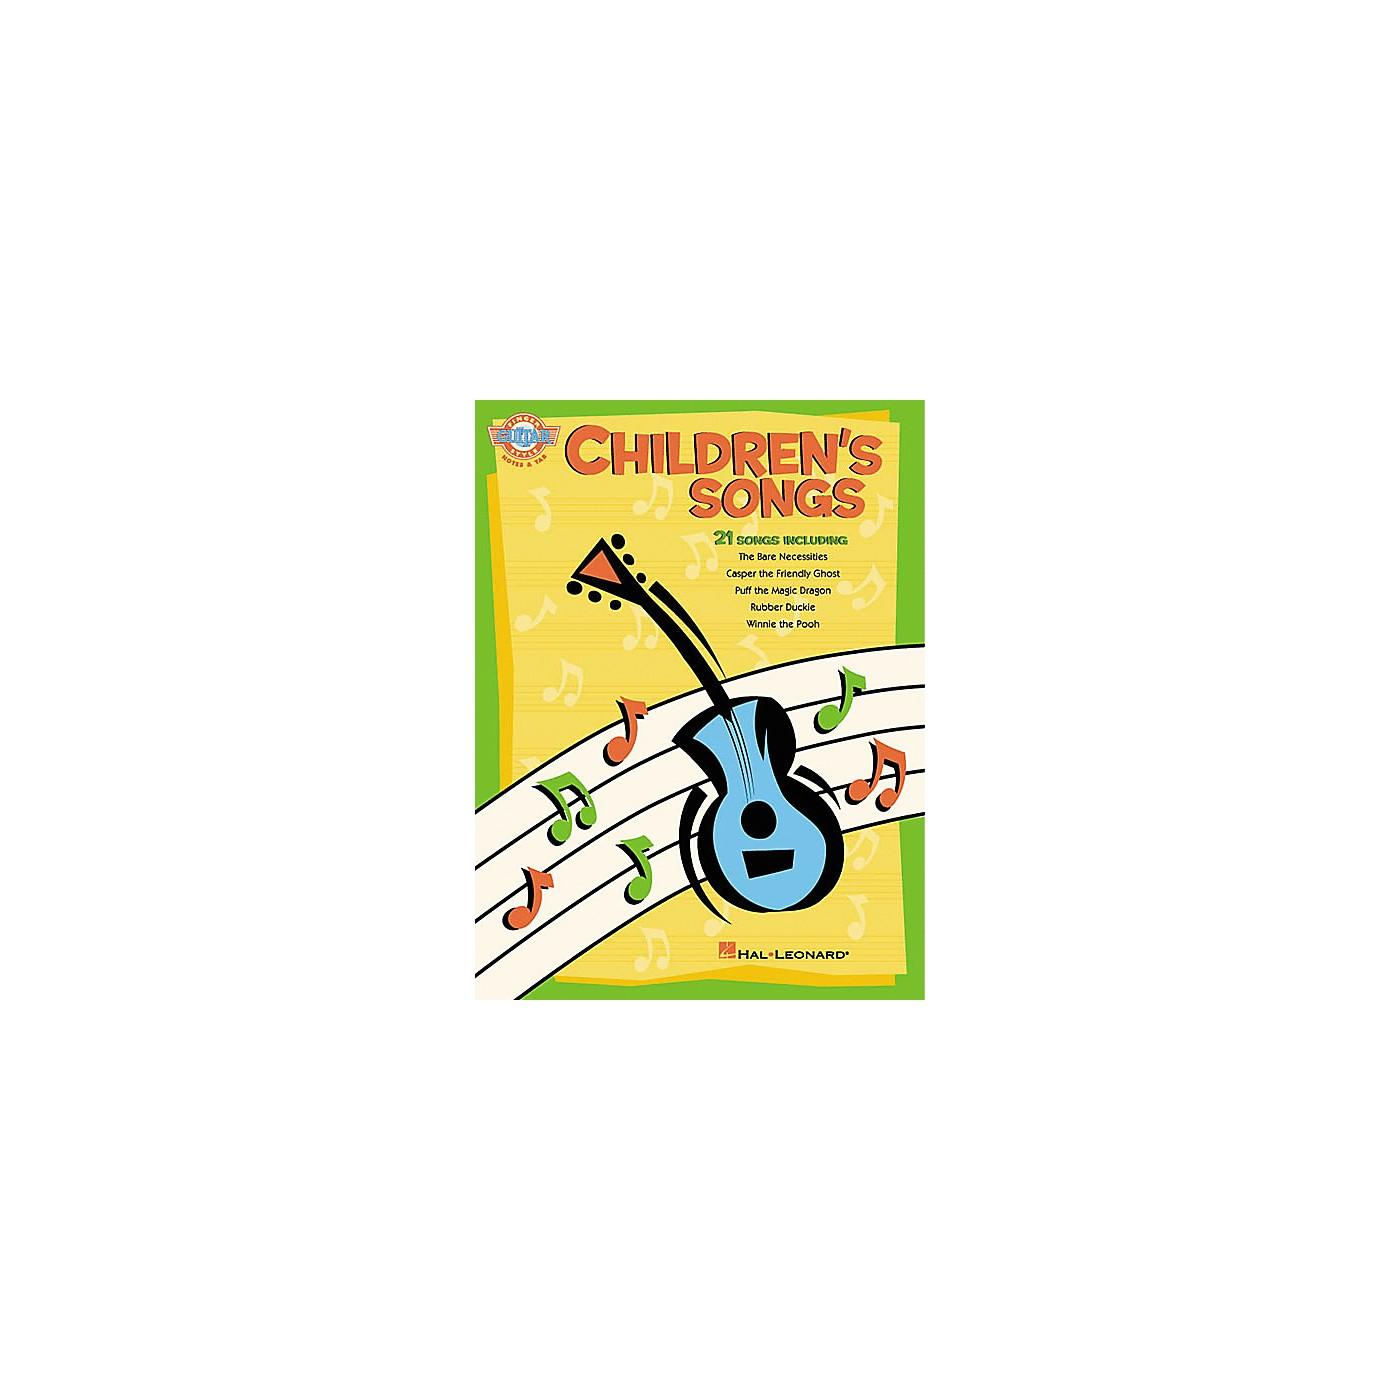 Hal Leonard Children's Songs Fingerstyle Guitar Book thumbnail